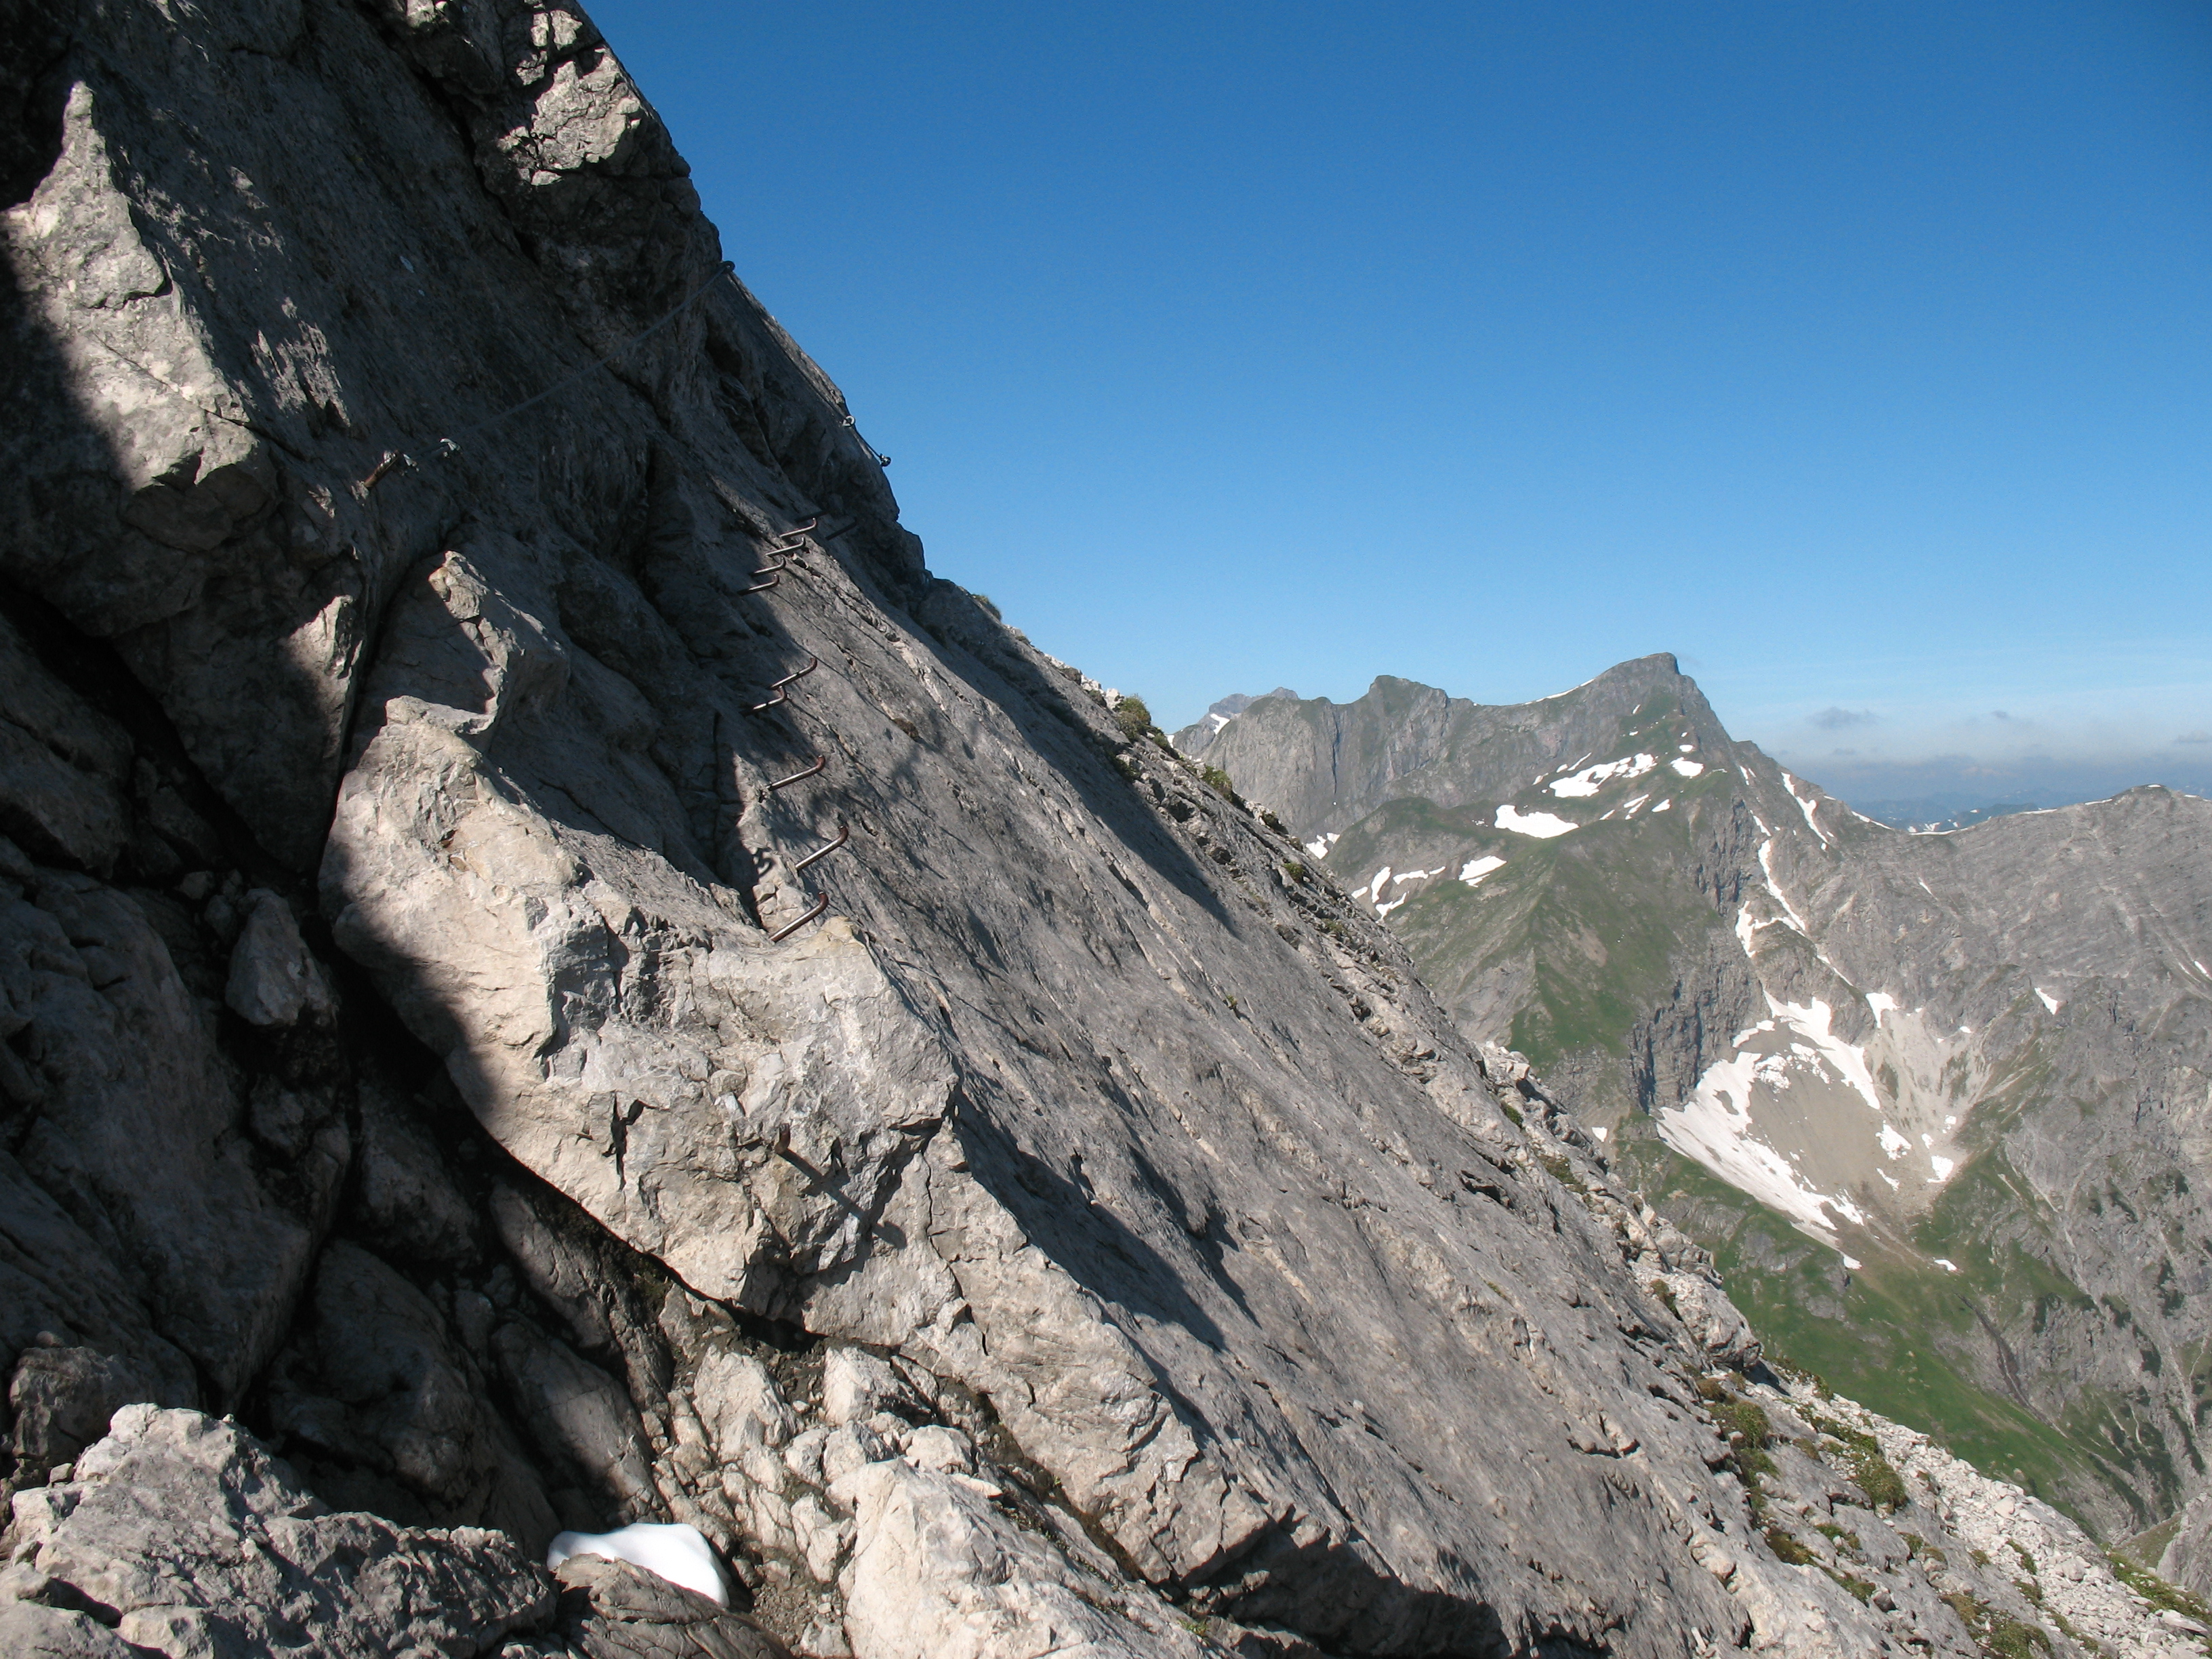 Klettersteig Mindelheimer : Klettersteig mindelheimer hÜtte